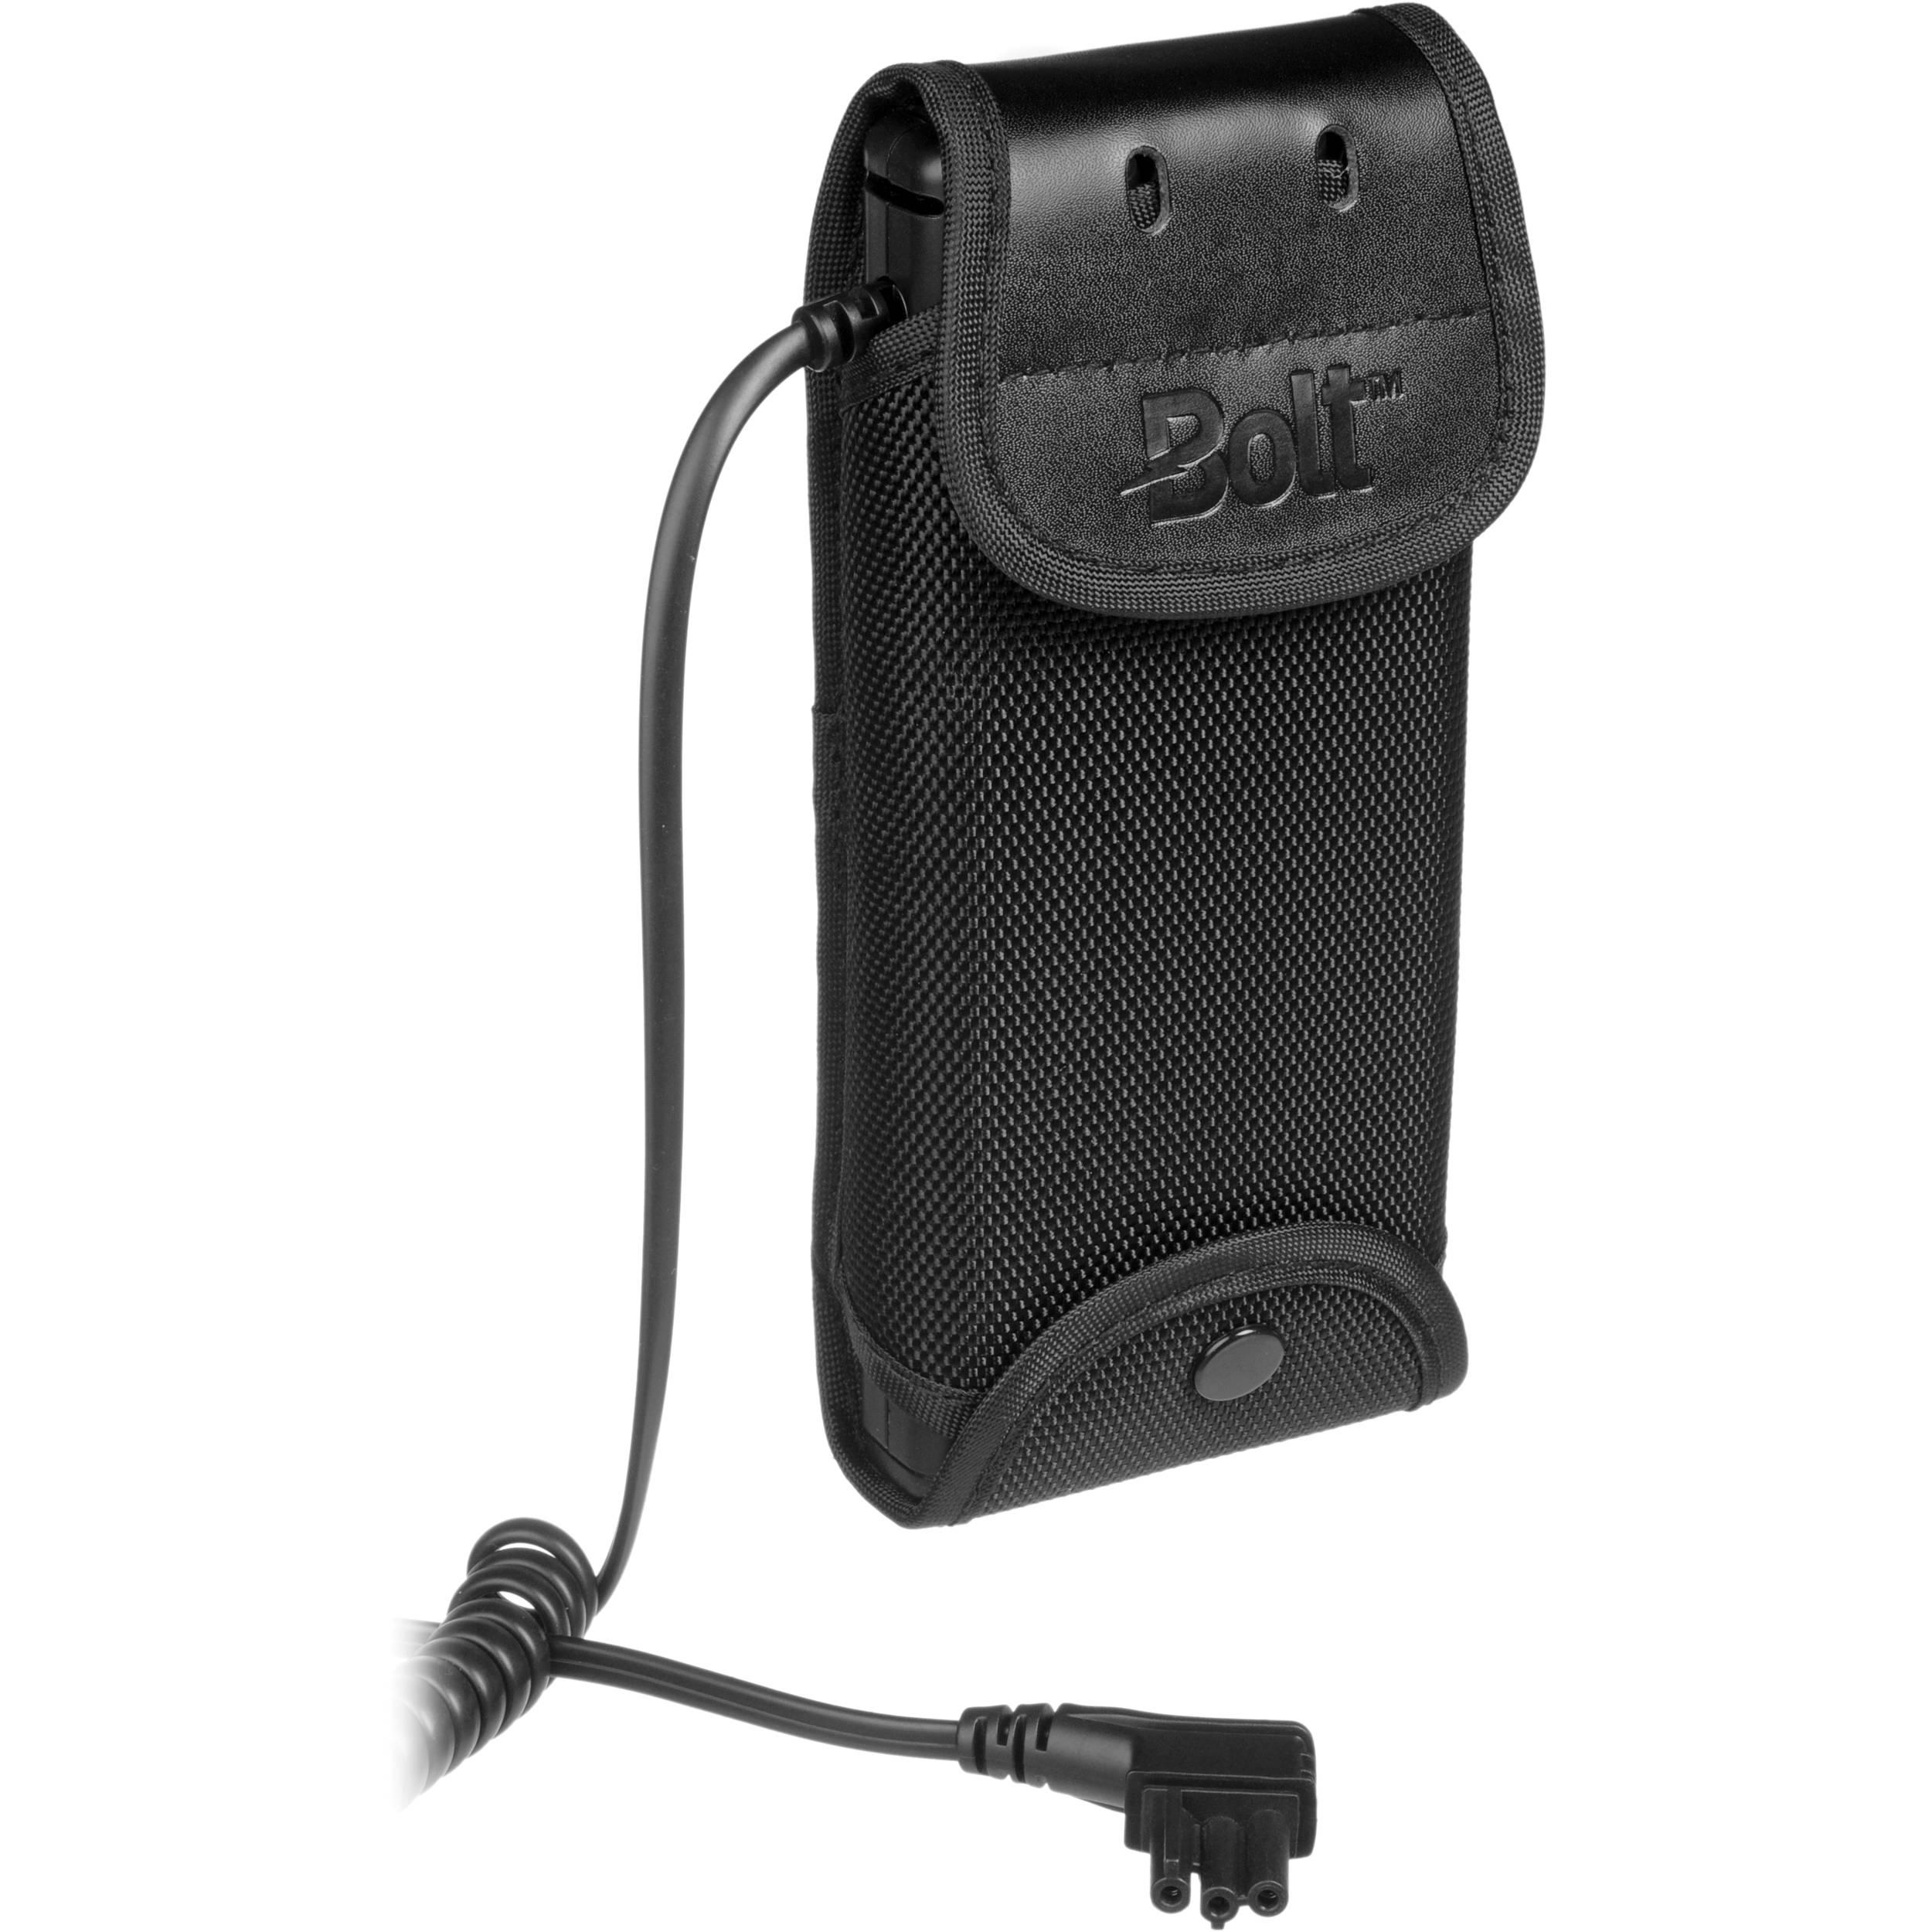 Nikon sb 910 bh photo video bolt cbp n2 compact battery pack for nikon sb 900 sb 910 baditri Images